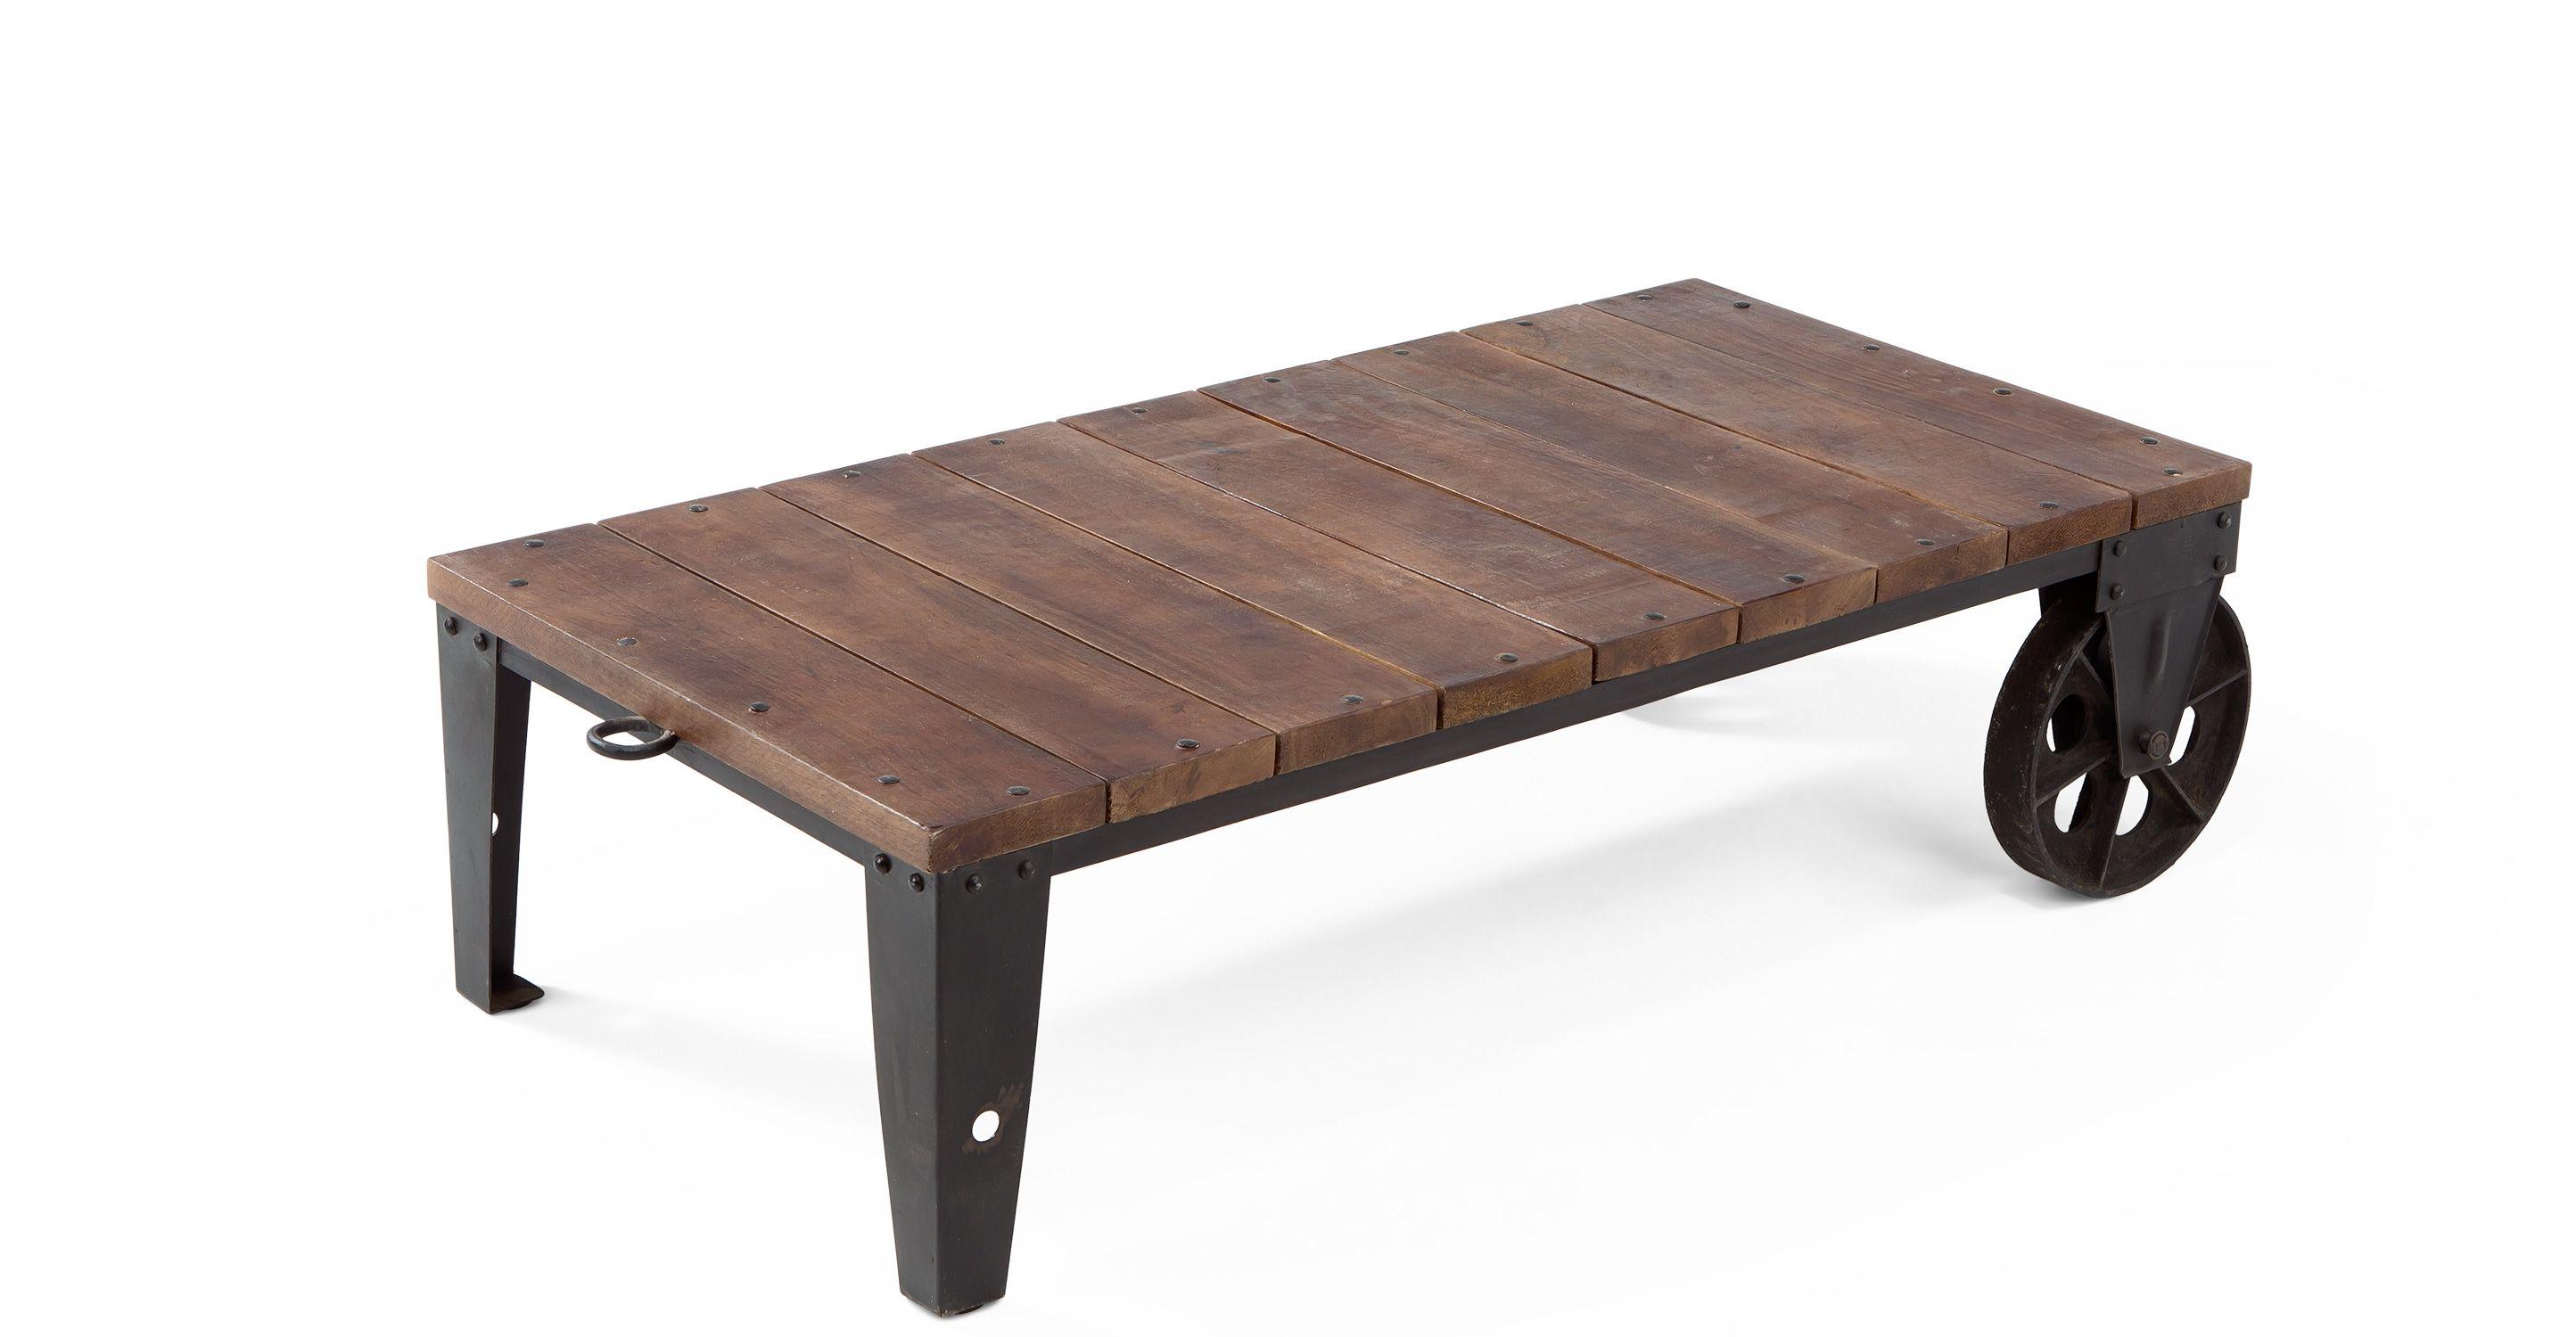 humphrey industrial coffee table in gunmetal | antiquariato